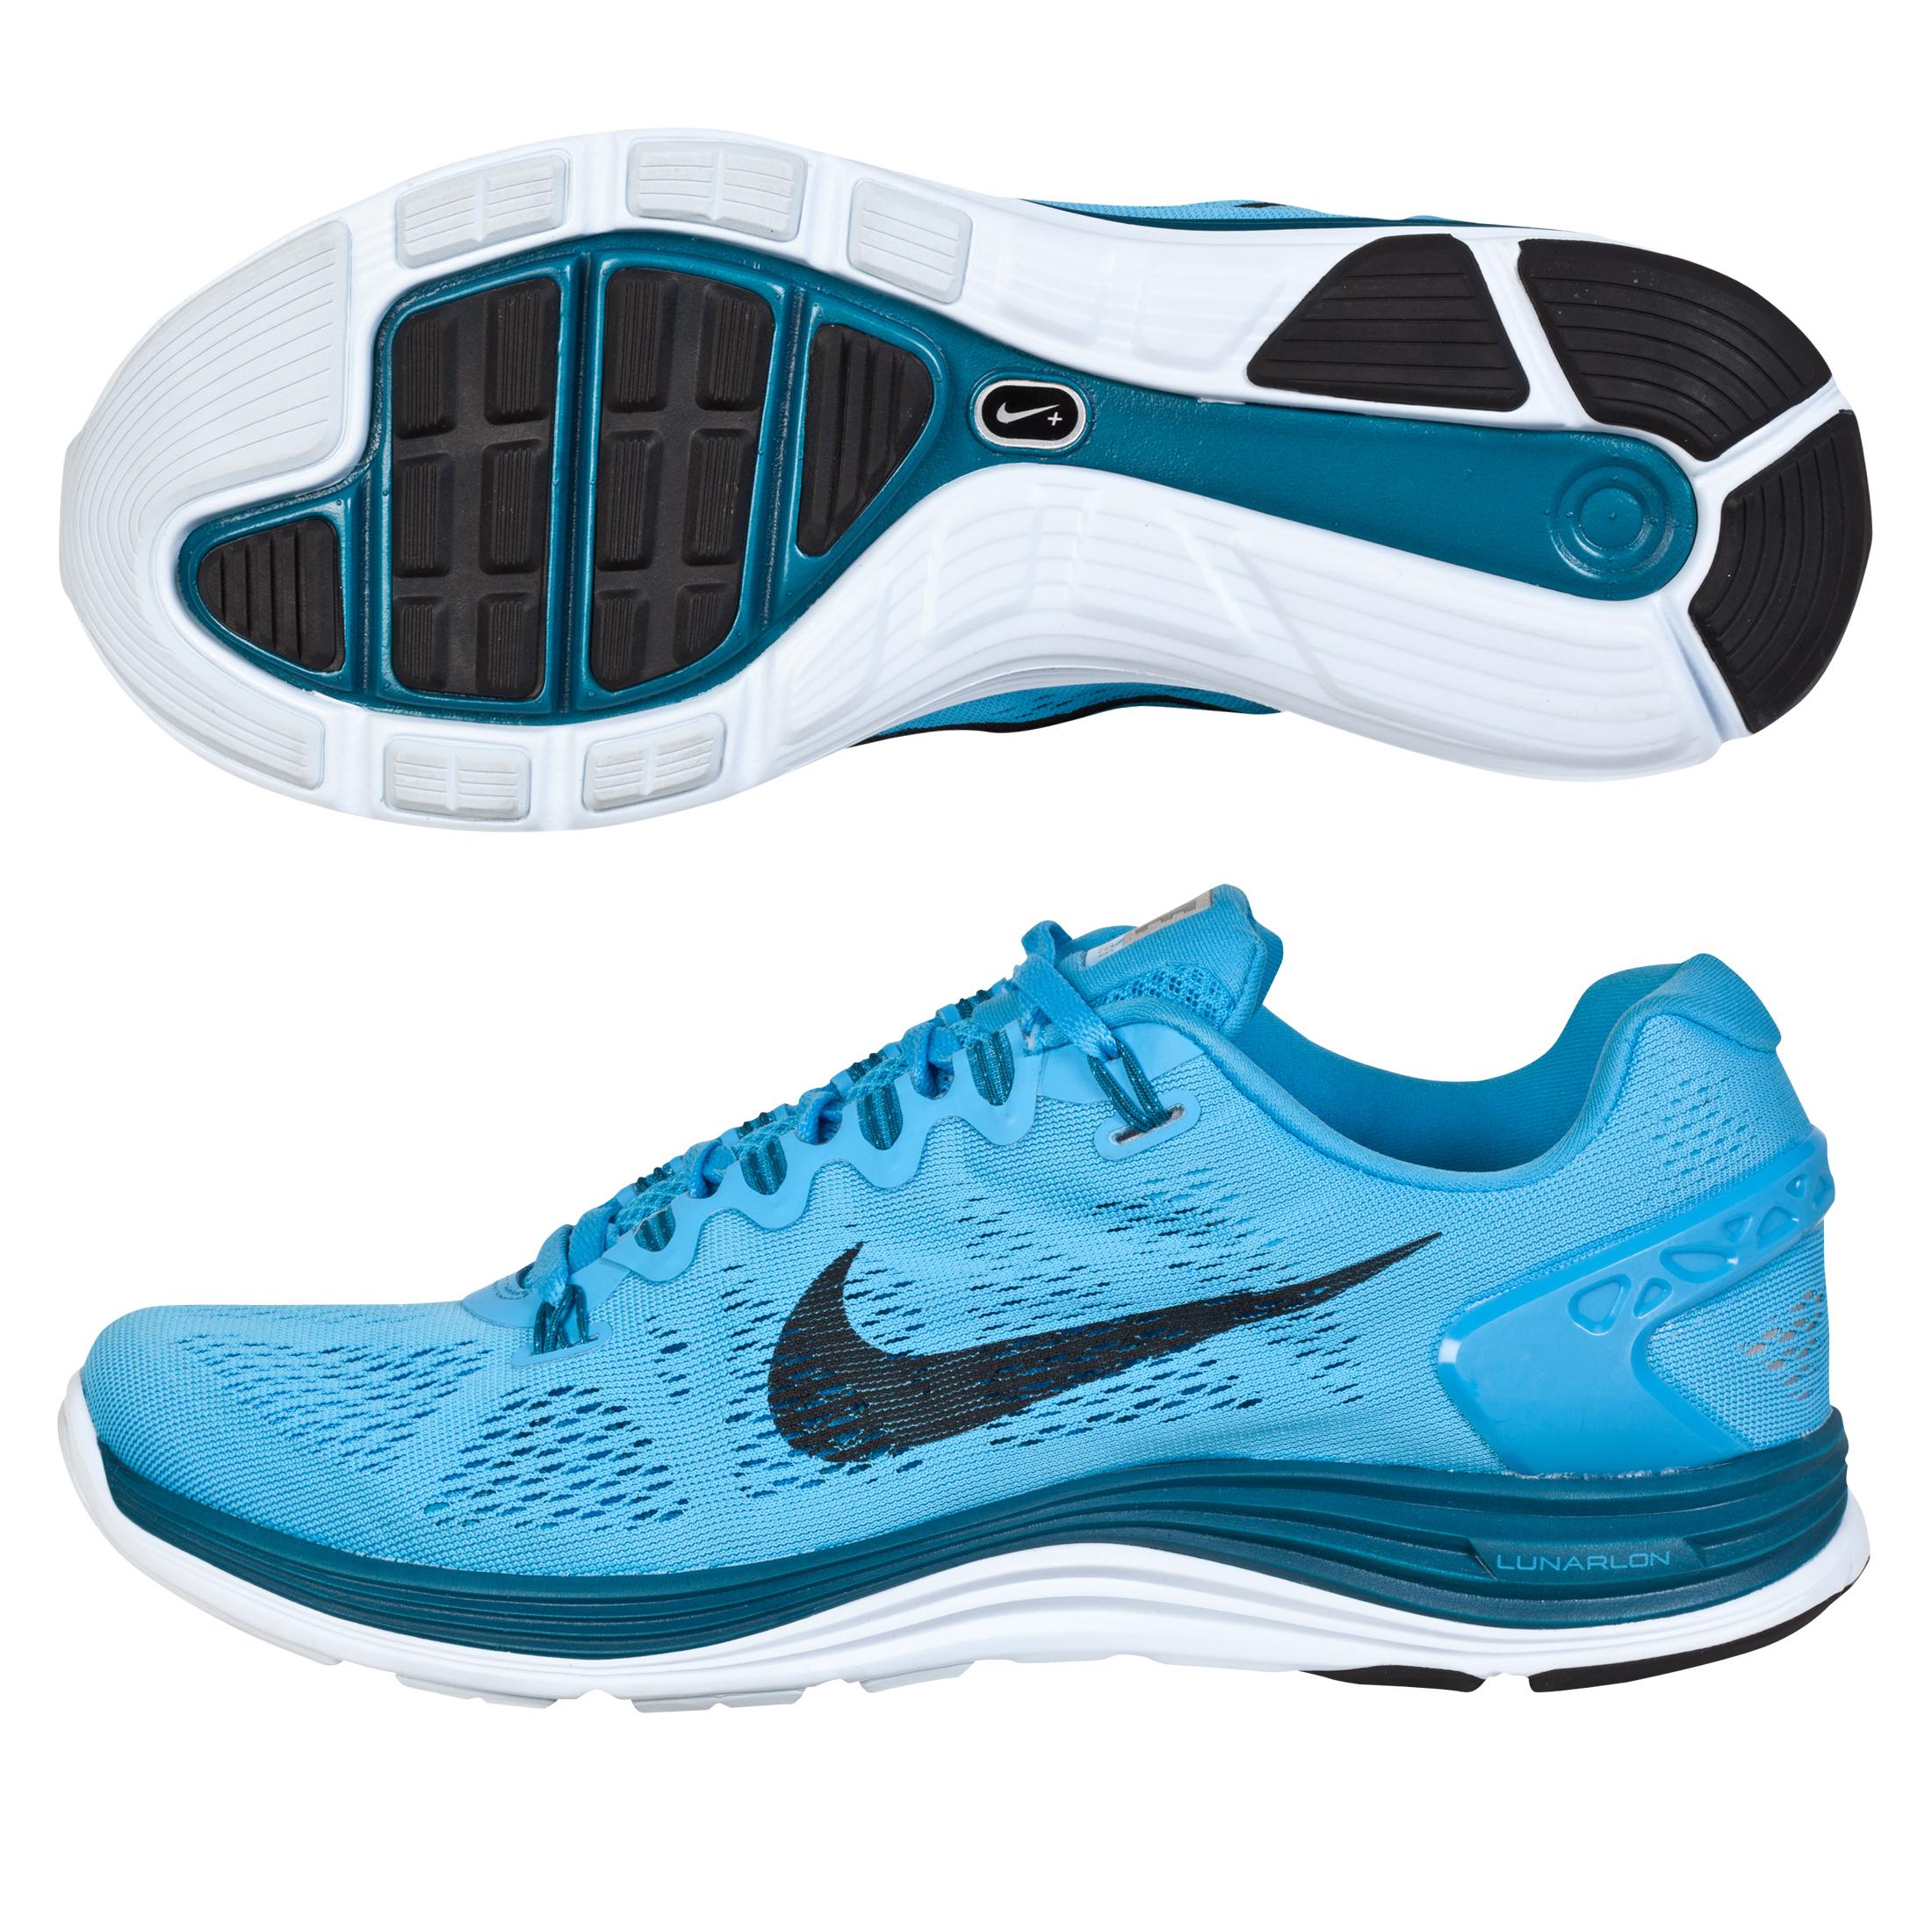 Nike Lunarglide 5 Trainer Blue